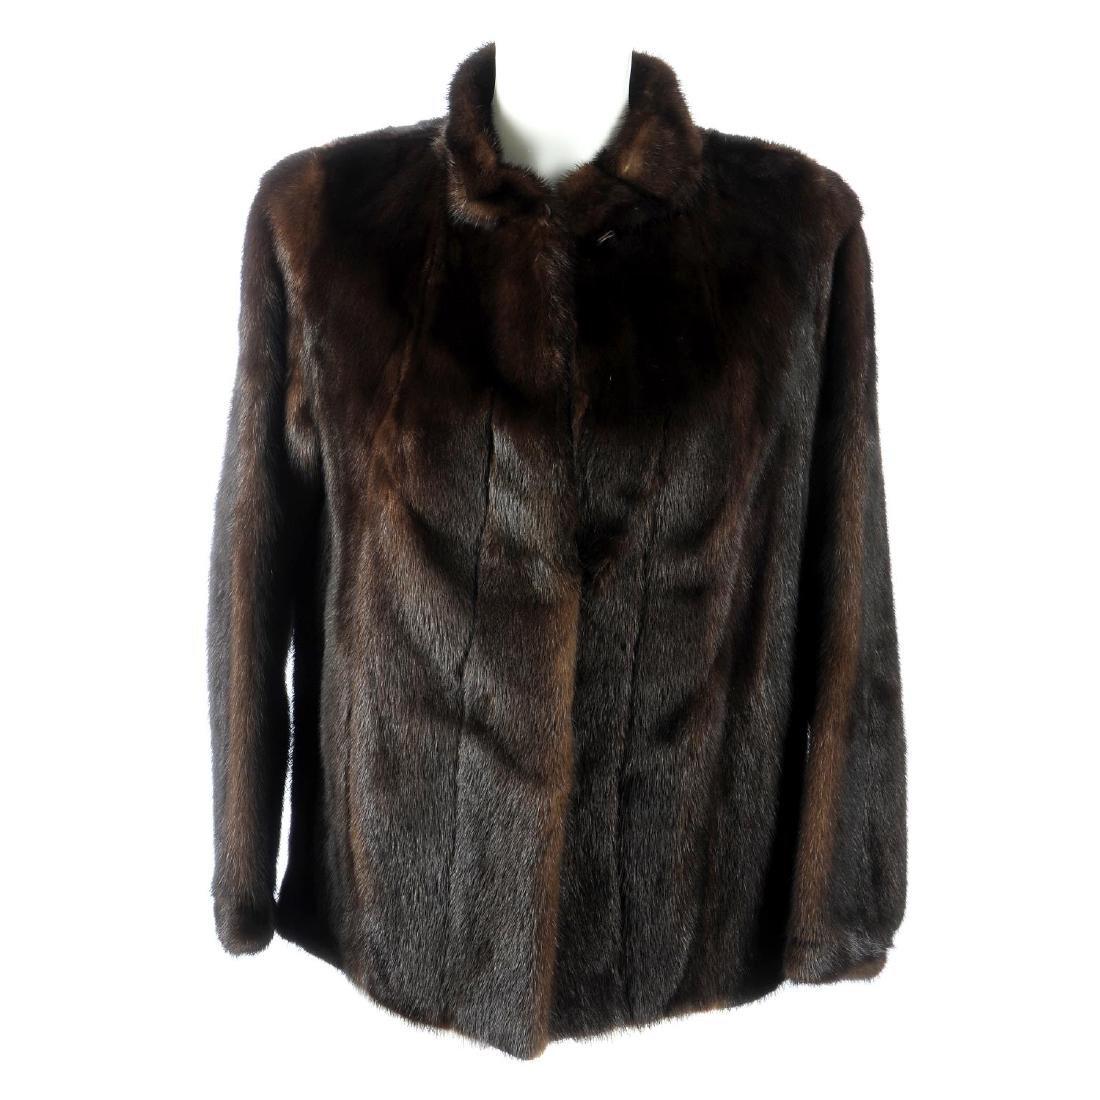 A dark ranch mink jacket. Designed with a short